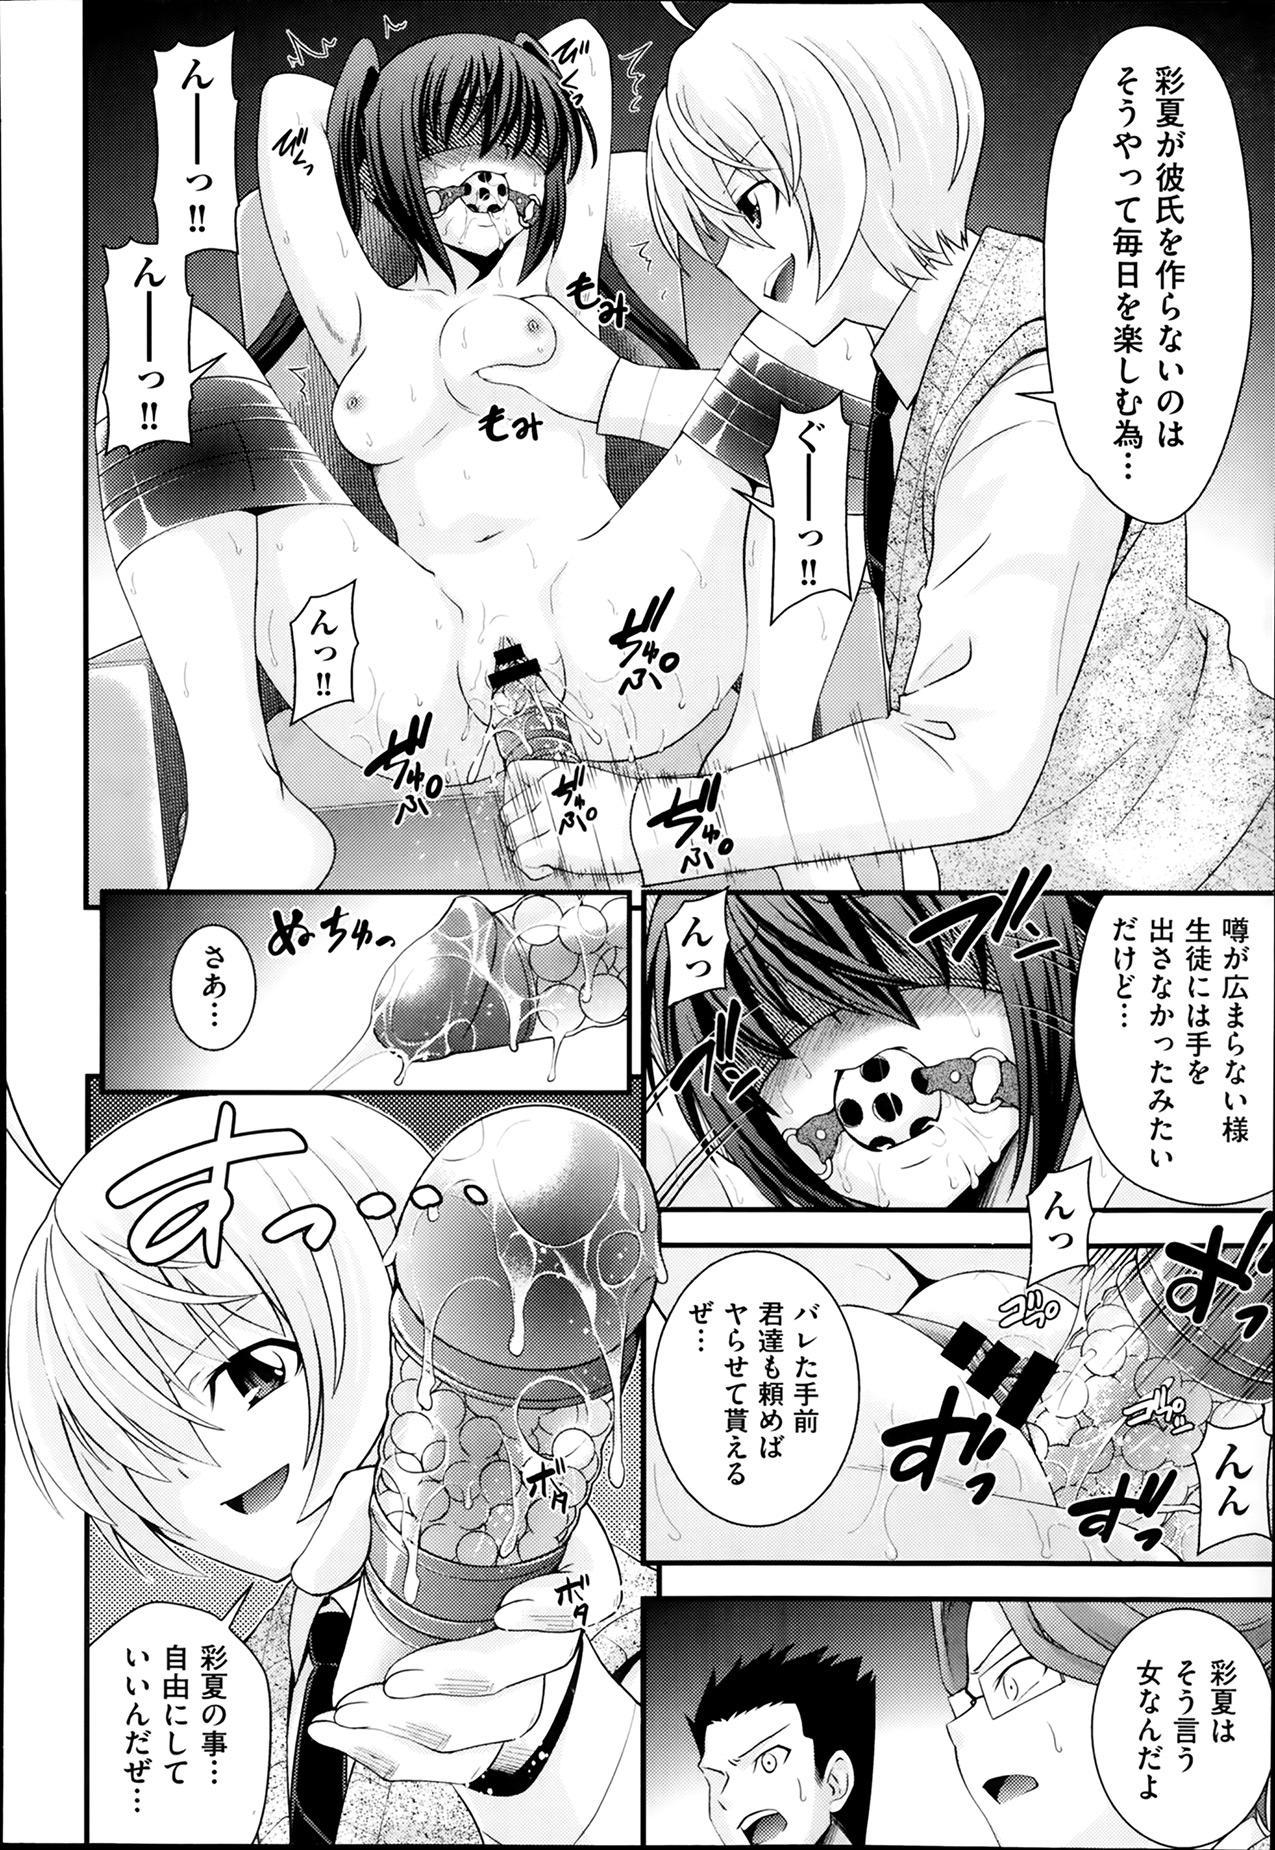 Kyoudai Replace 77